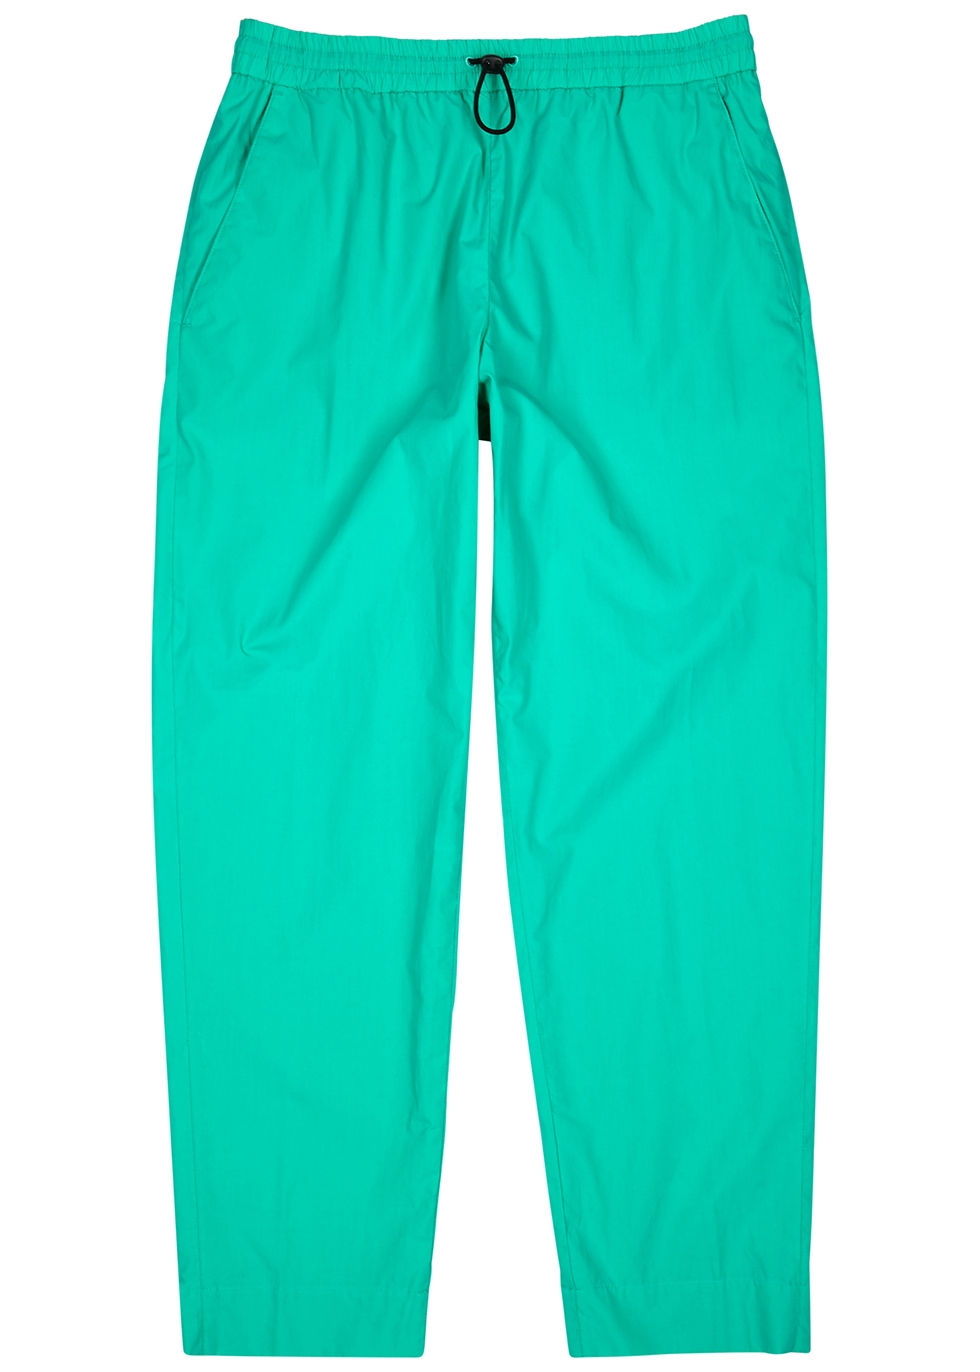 Turquoise cotton sweatpants